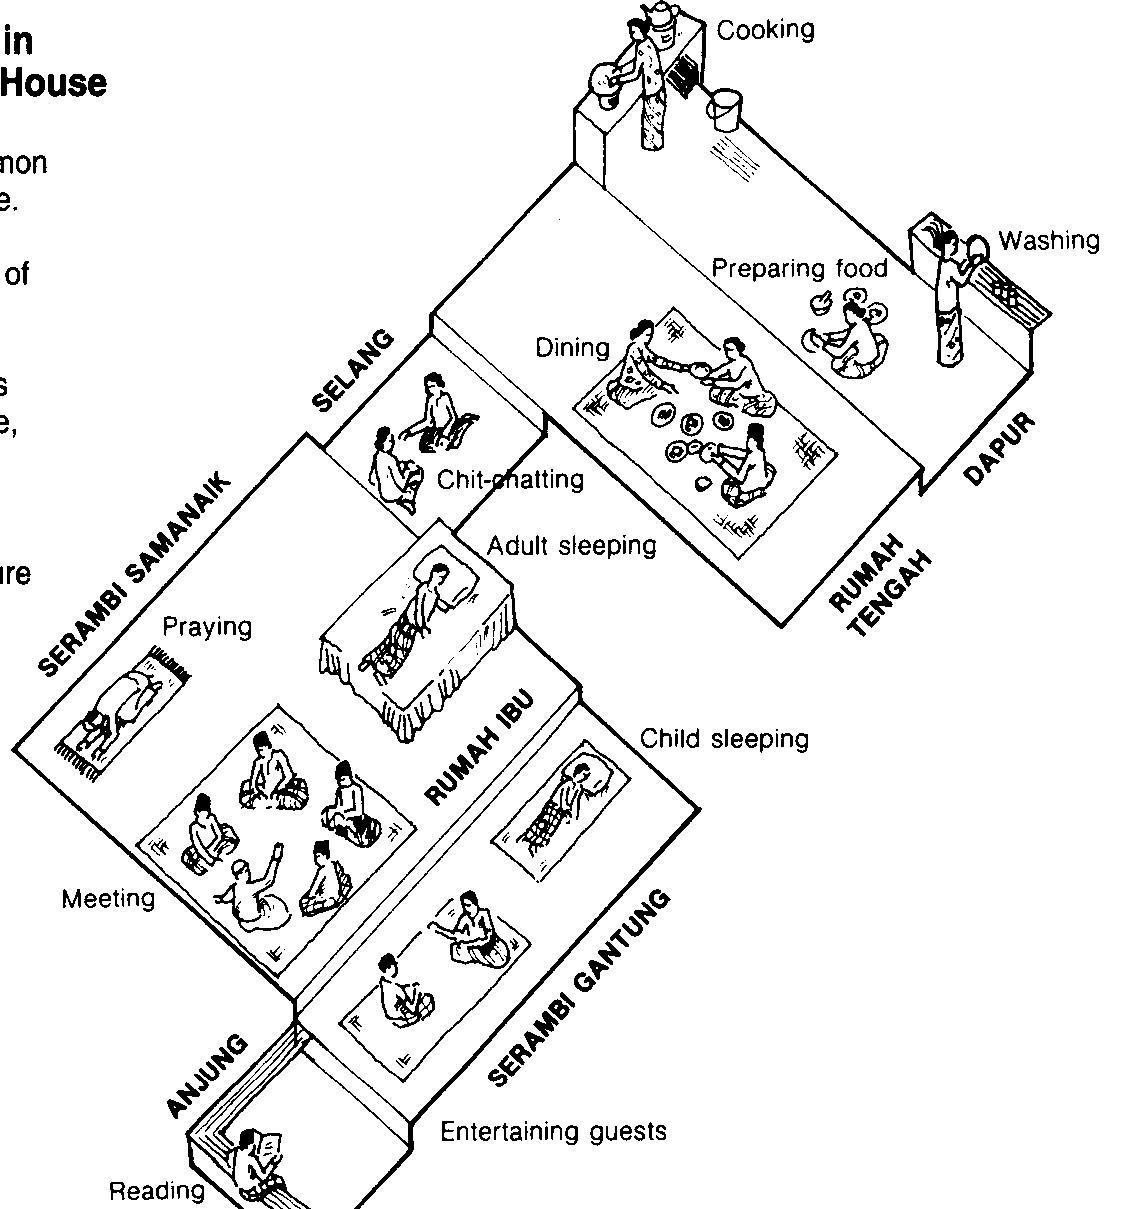 Malay+house Malay Traditional House Design on japanese home interior design, thai house design, traditional malay food, traditional malay house wallpaper, chinese house design, asian house design, kerala style house design, indian house design, japanese tea house building design,